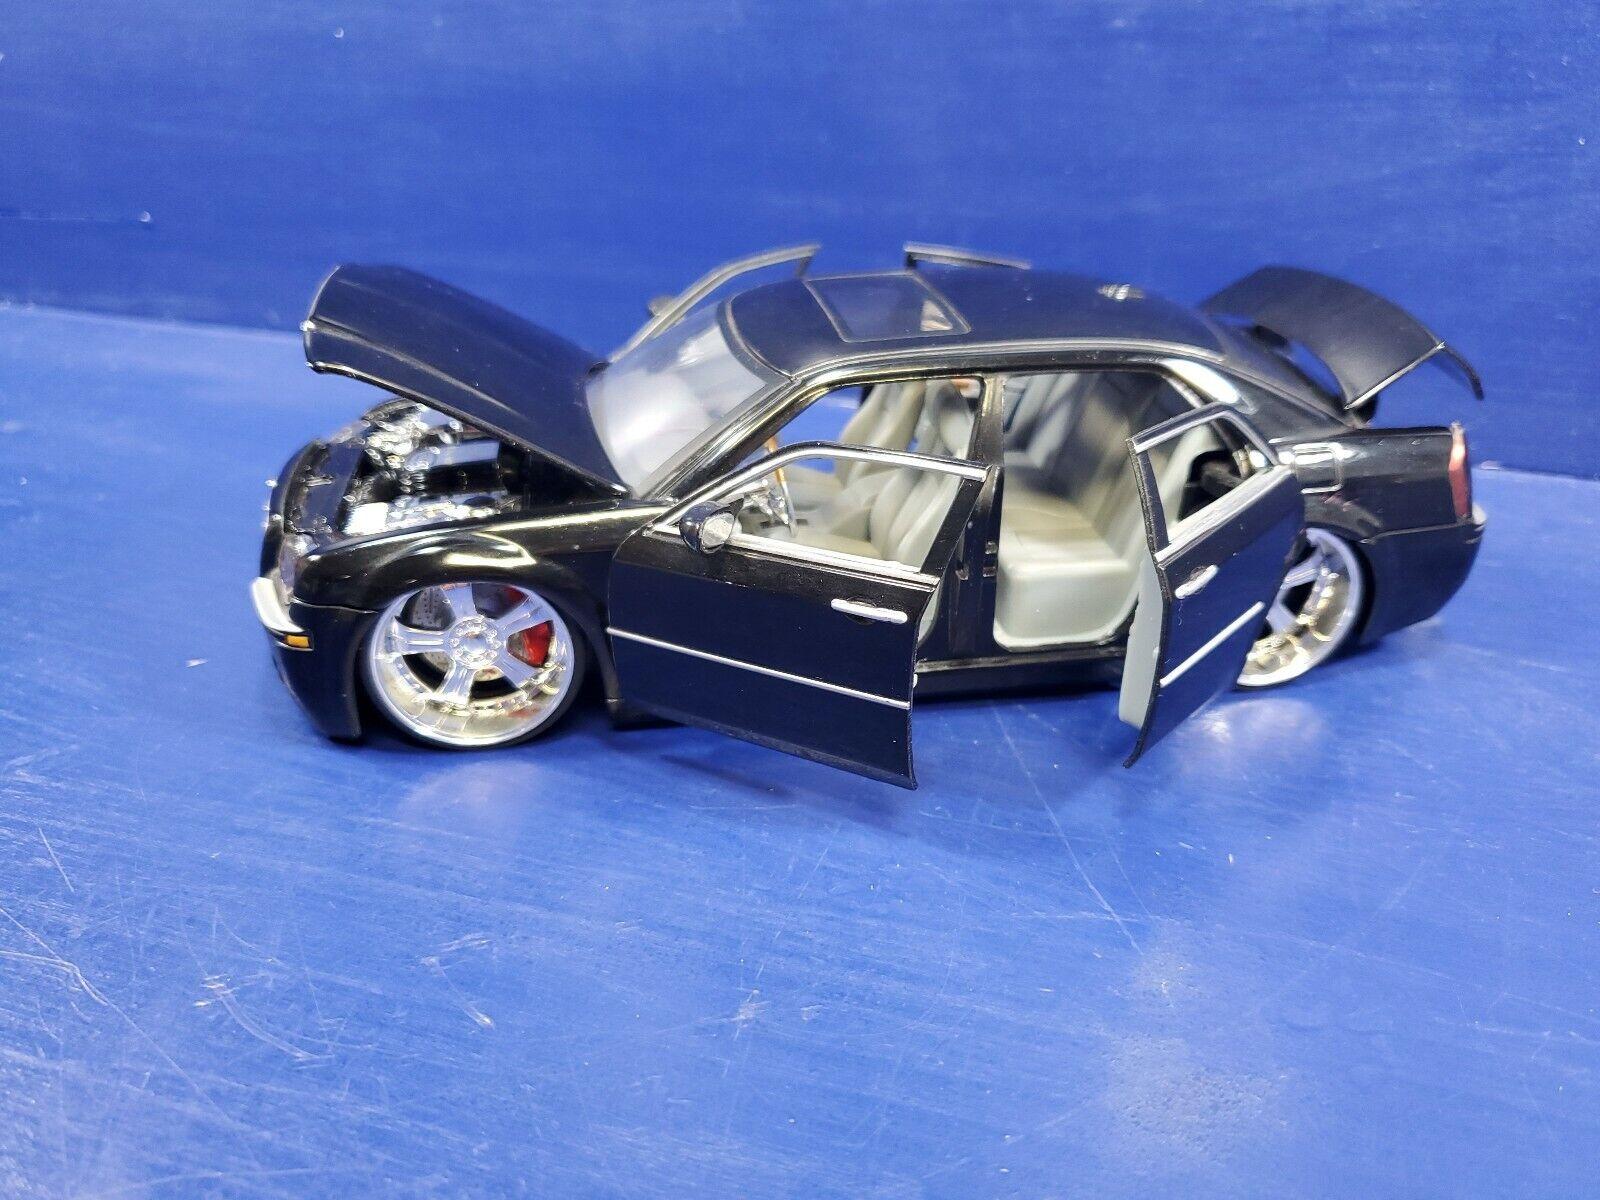 Jada Escala 2005 Chrysler 300 Hemi 1 24 Usado Sin Caja 2005 ya no hecho